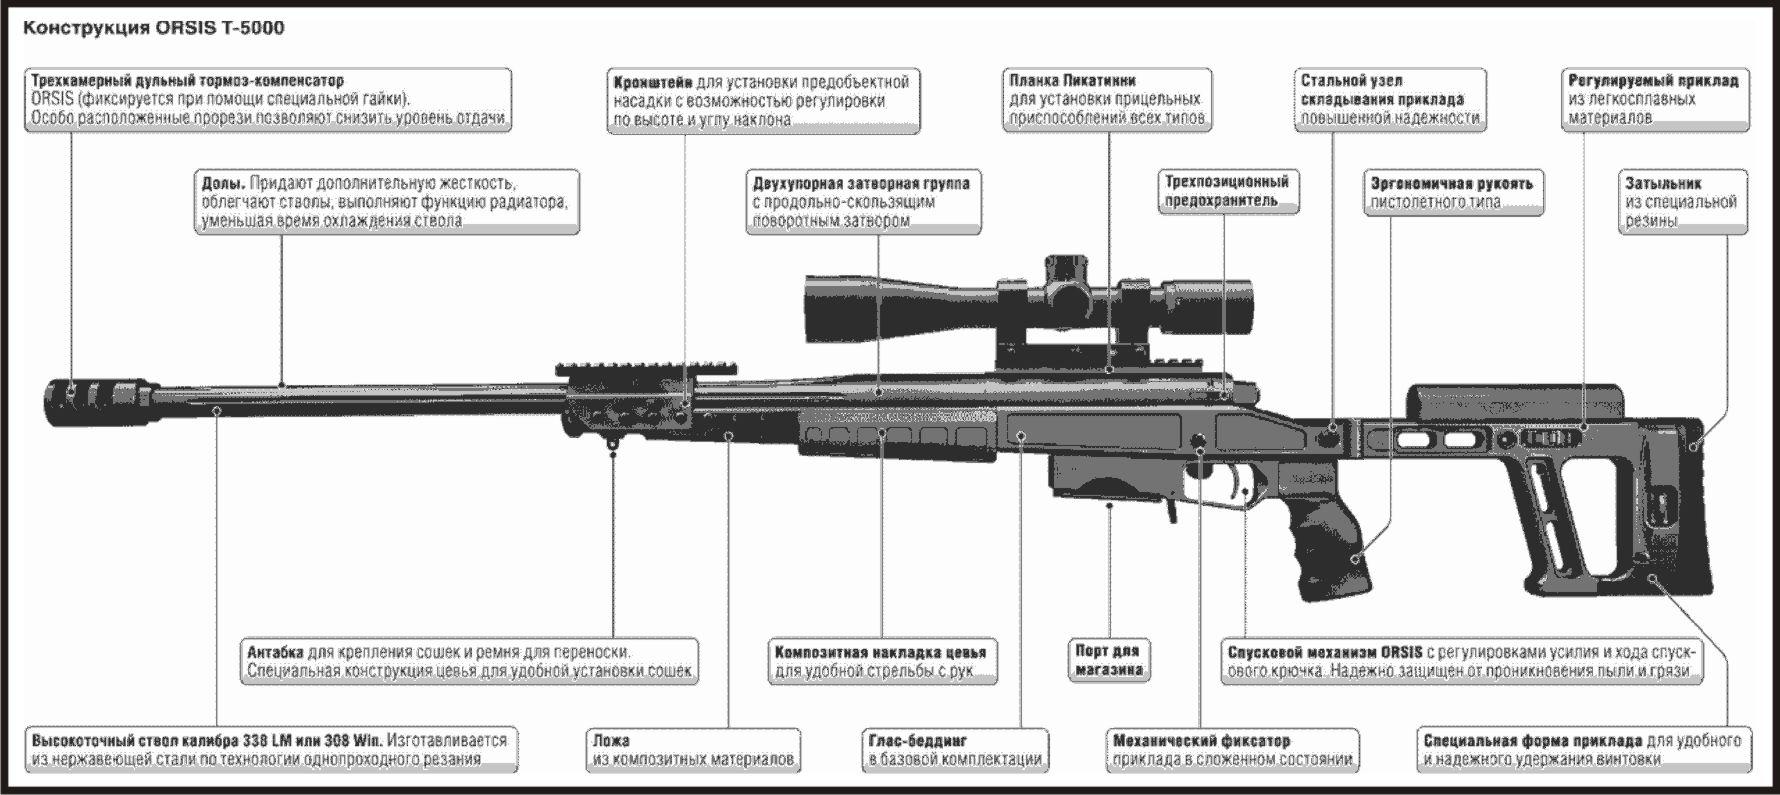 винтовка т 5000 характеристики